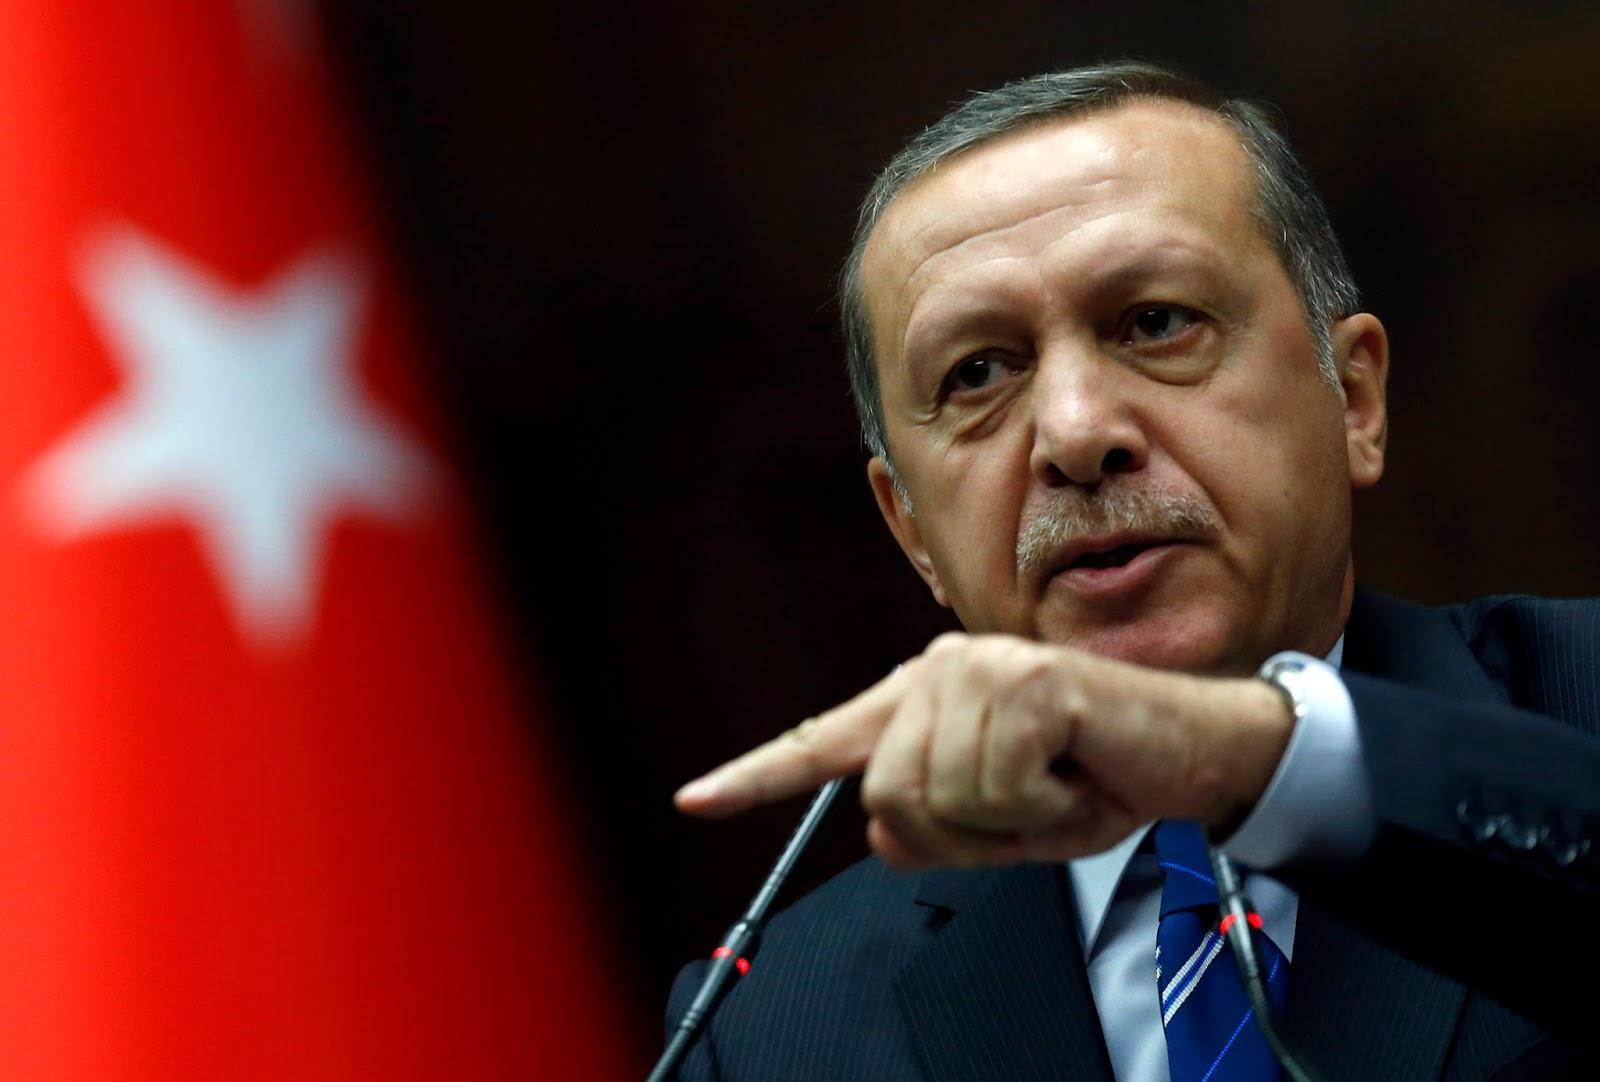 Erdogan: Hai Asad Sang Pembunuh, Kenapa Kamu Berlepas Tangan?